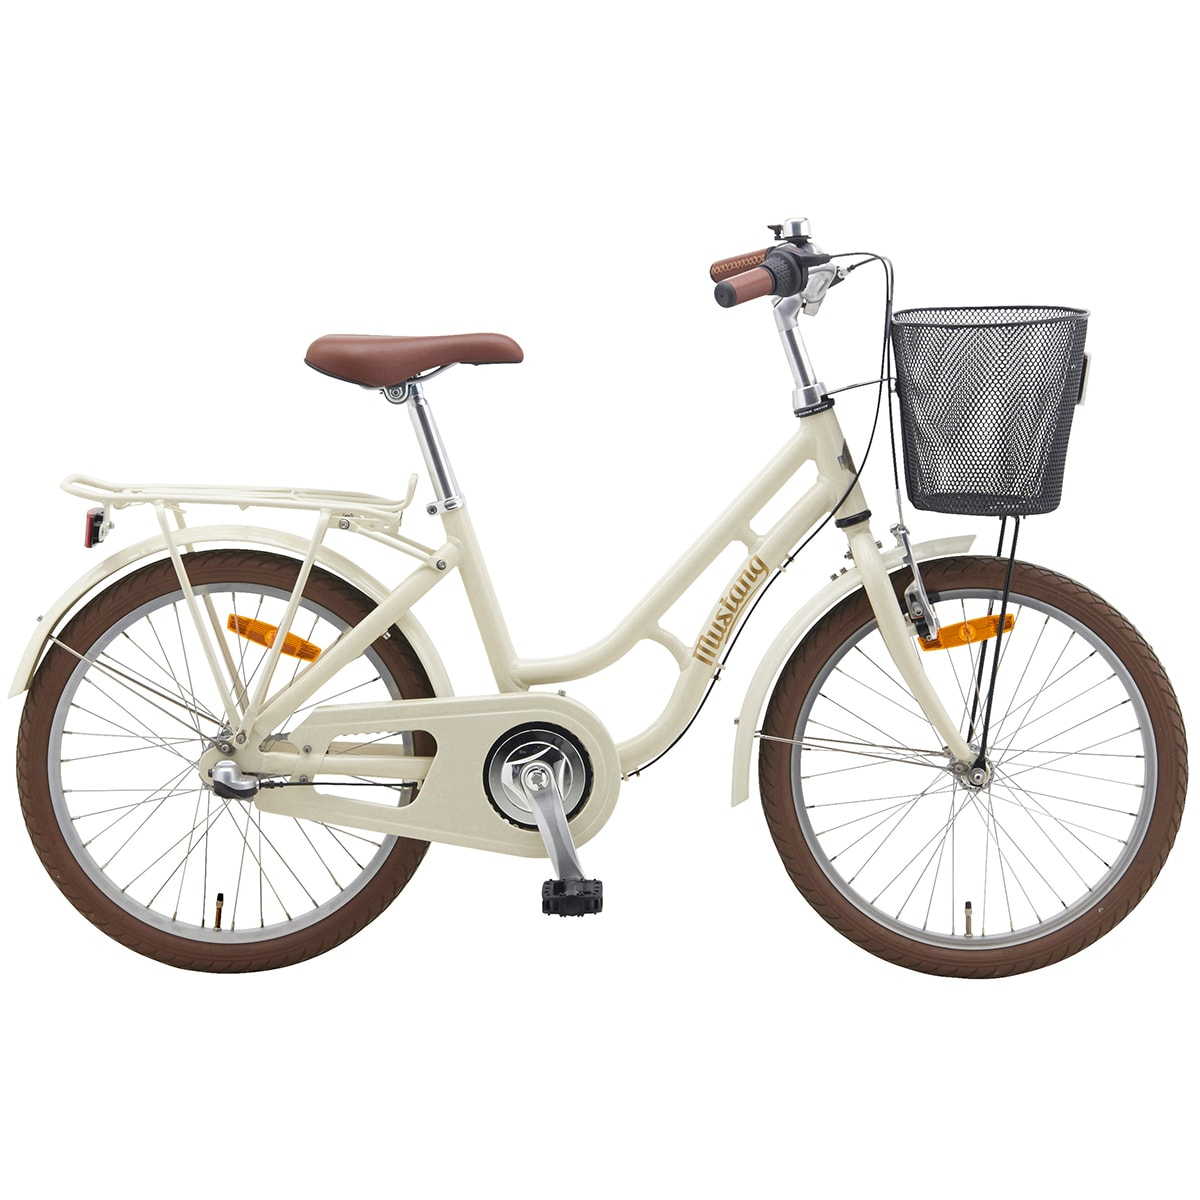 Klassisk cykel til små damer på 6-8 år